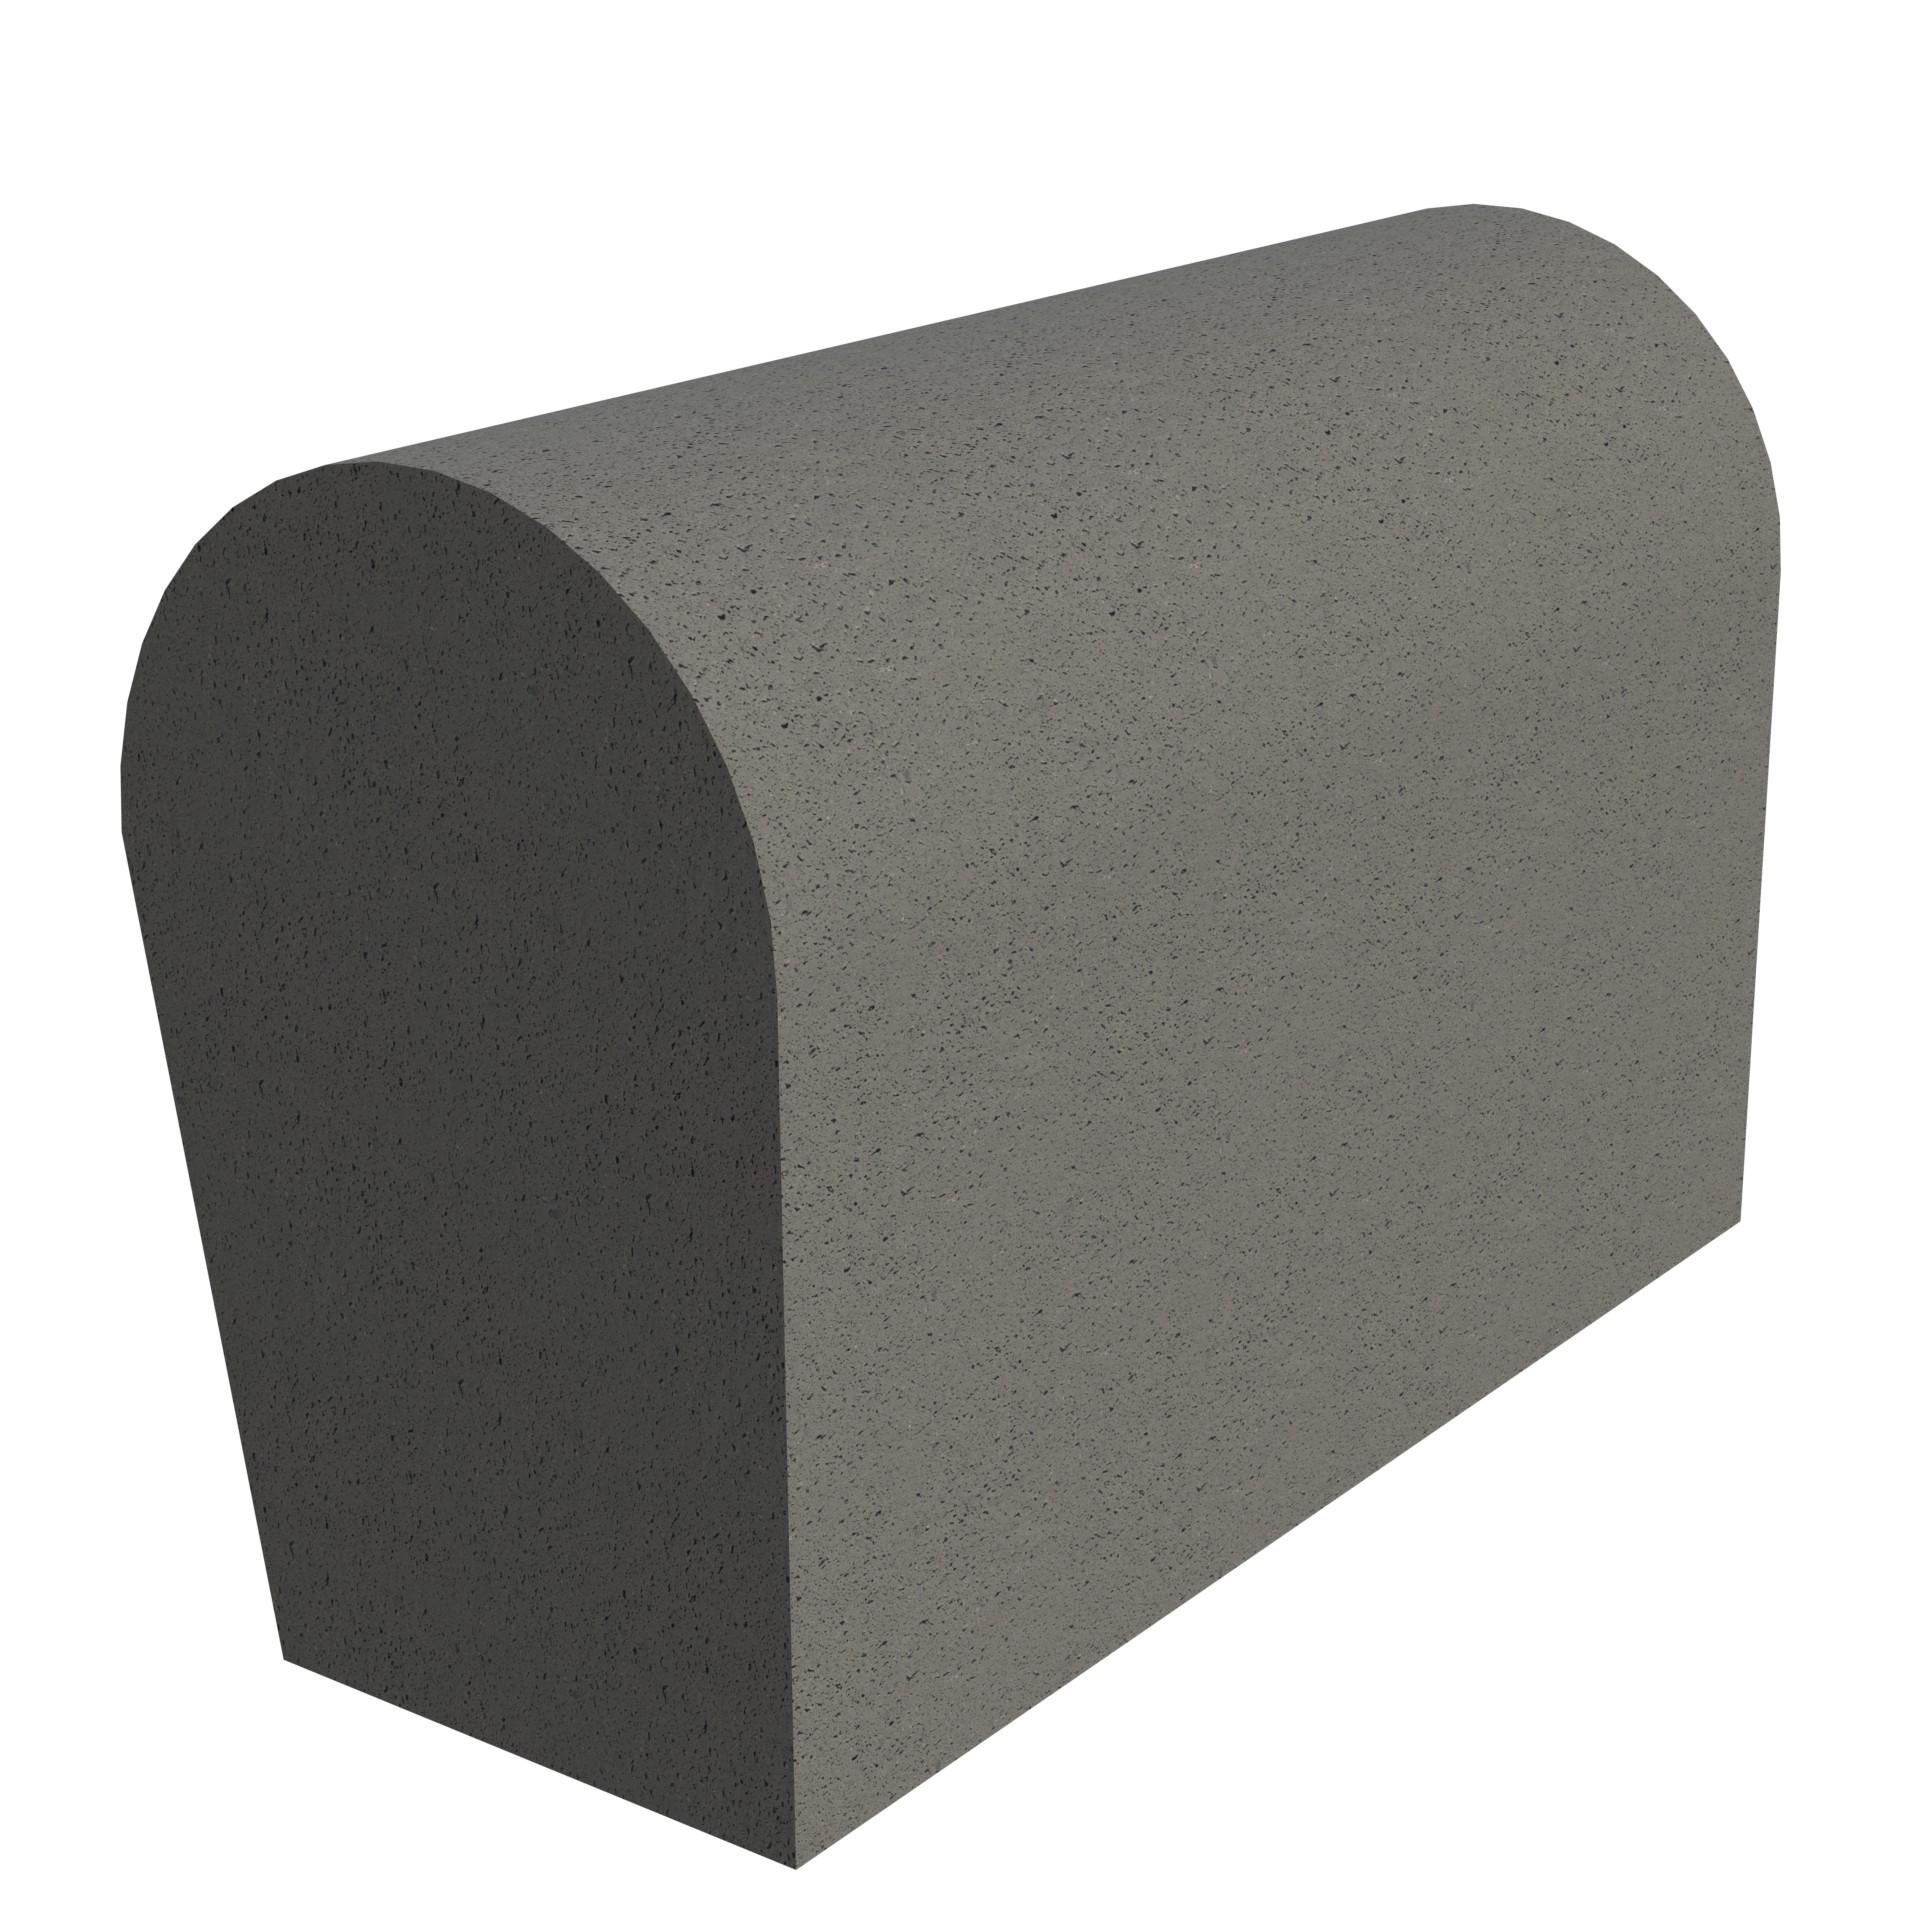 SANDTOFT TILES - Concrete Half Round Mono Ridge With Block End RH